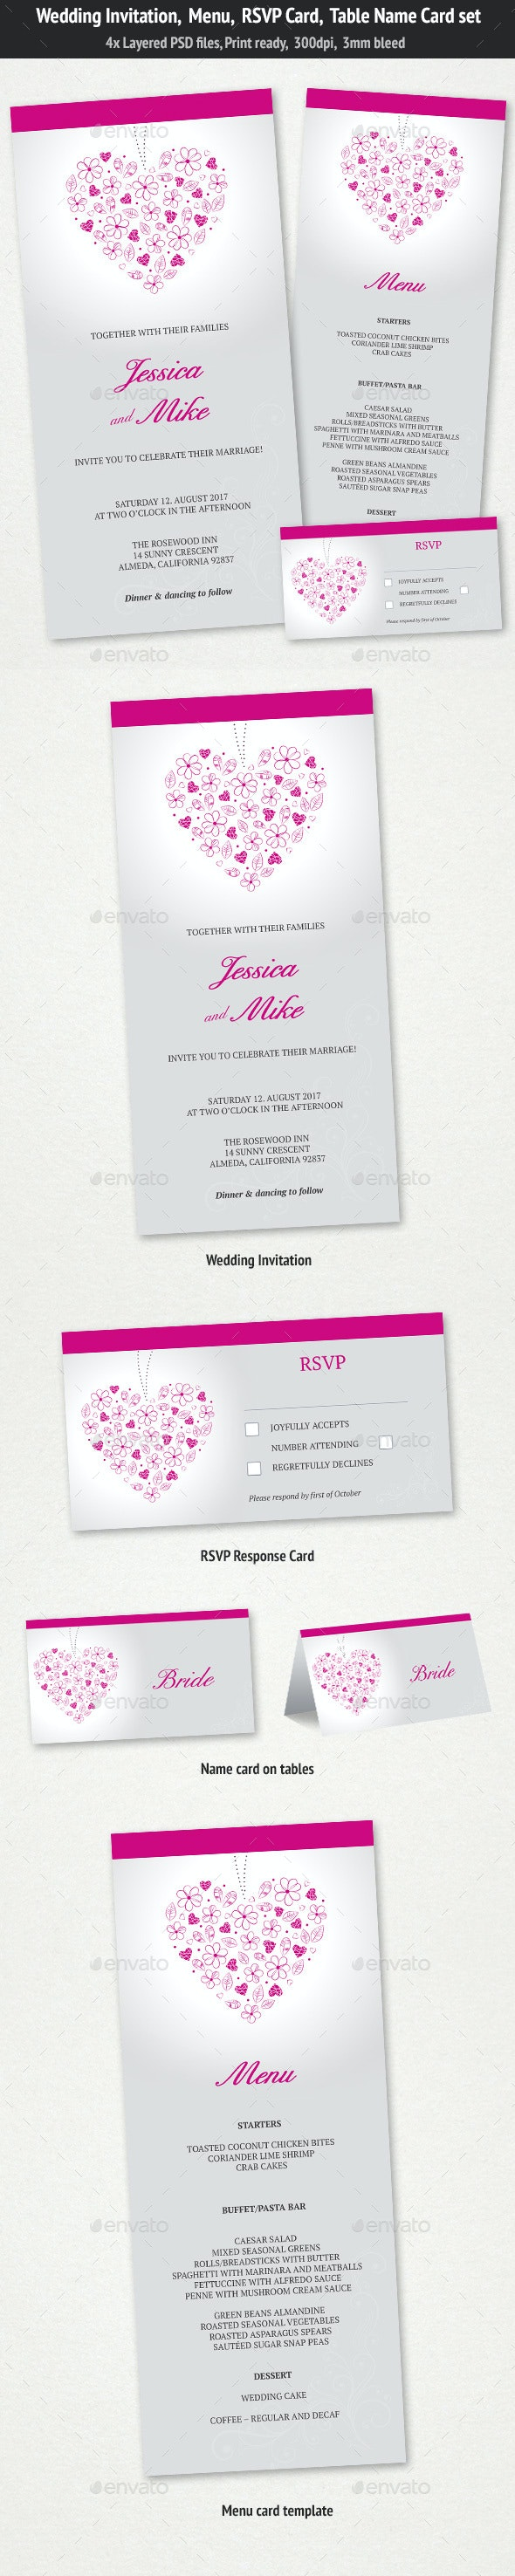 Wedding Invitation, Menu & RSVP Card Set - Weddings Cards & Invites